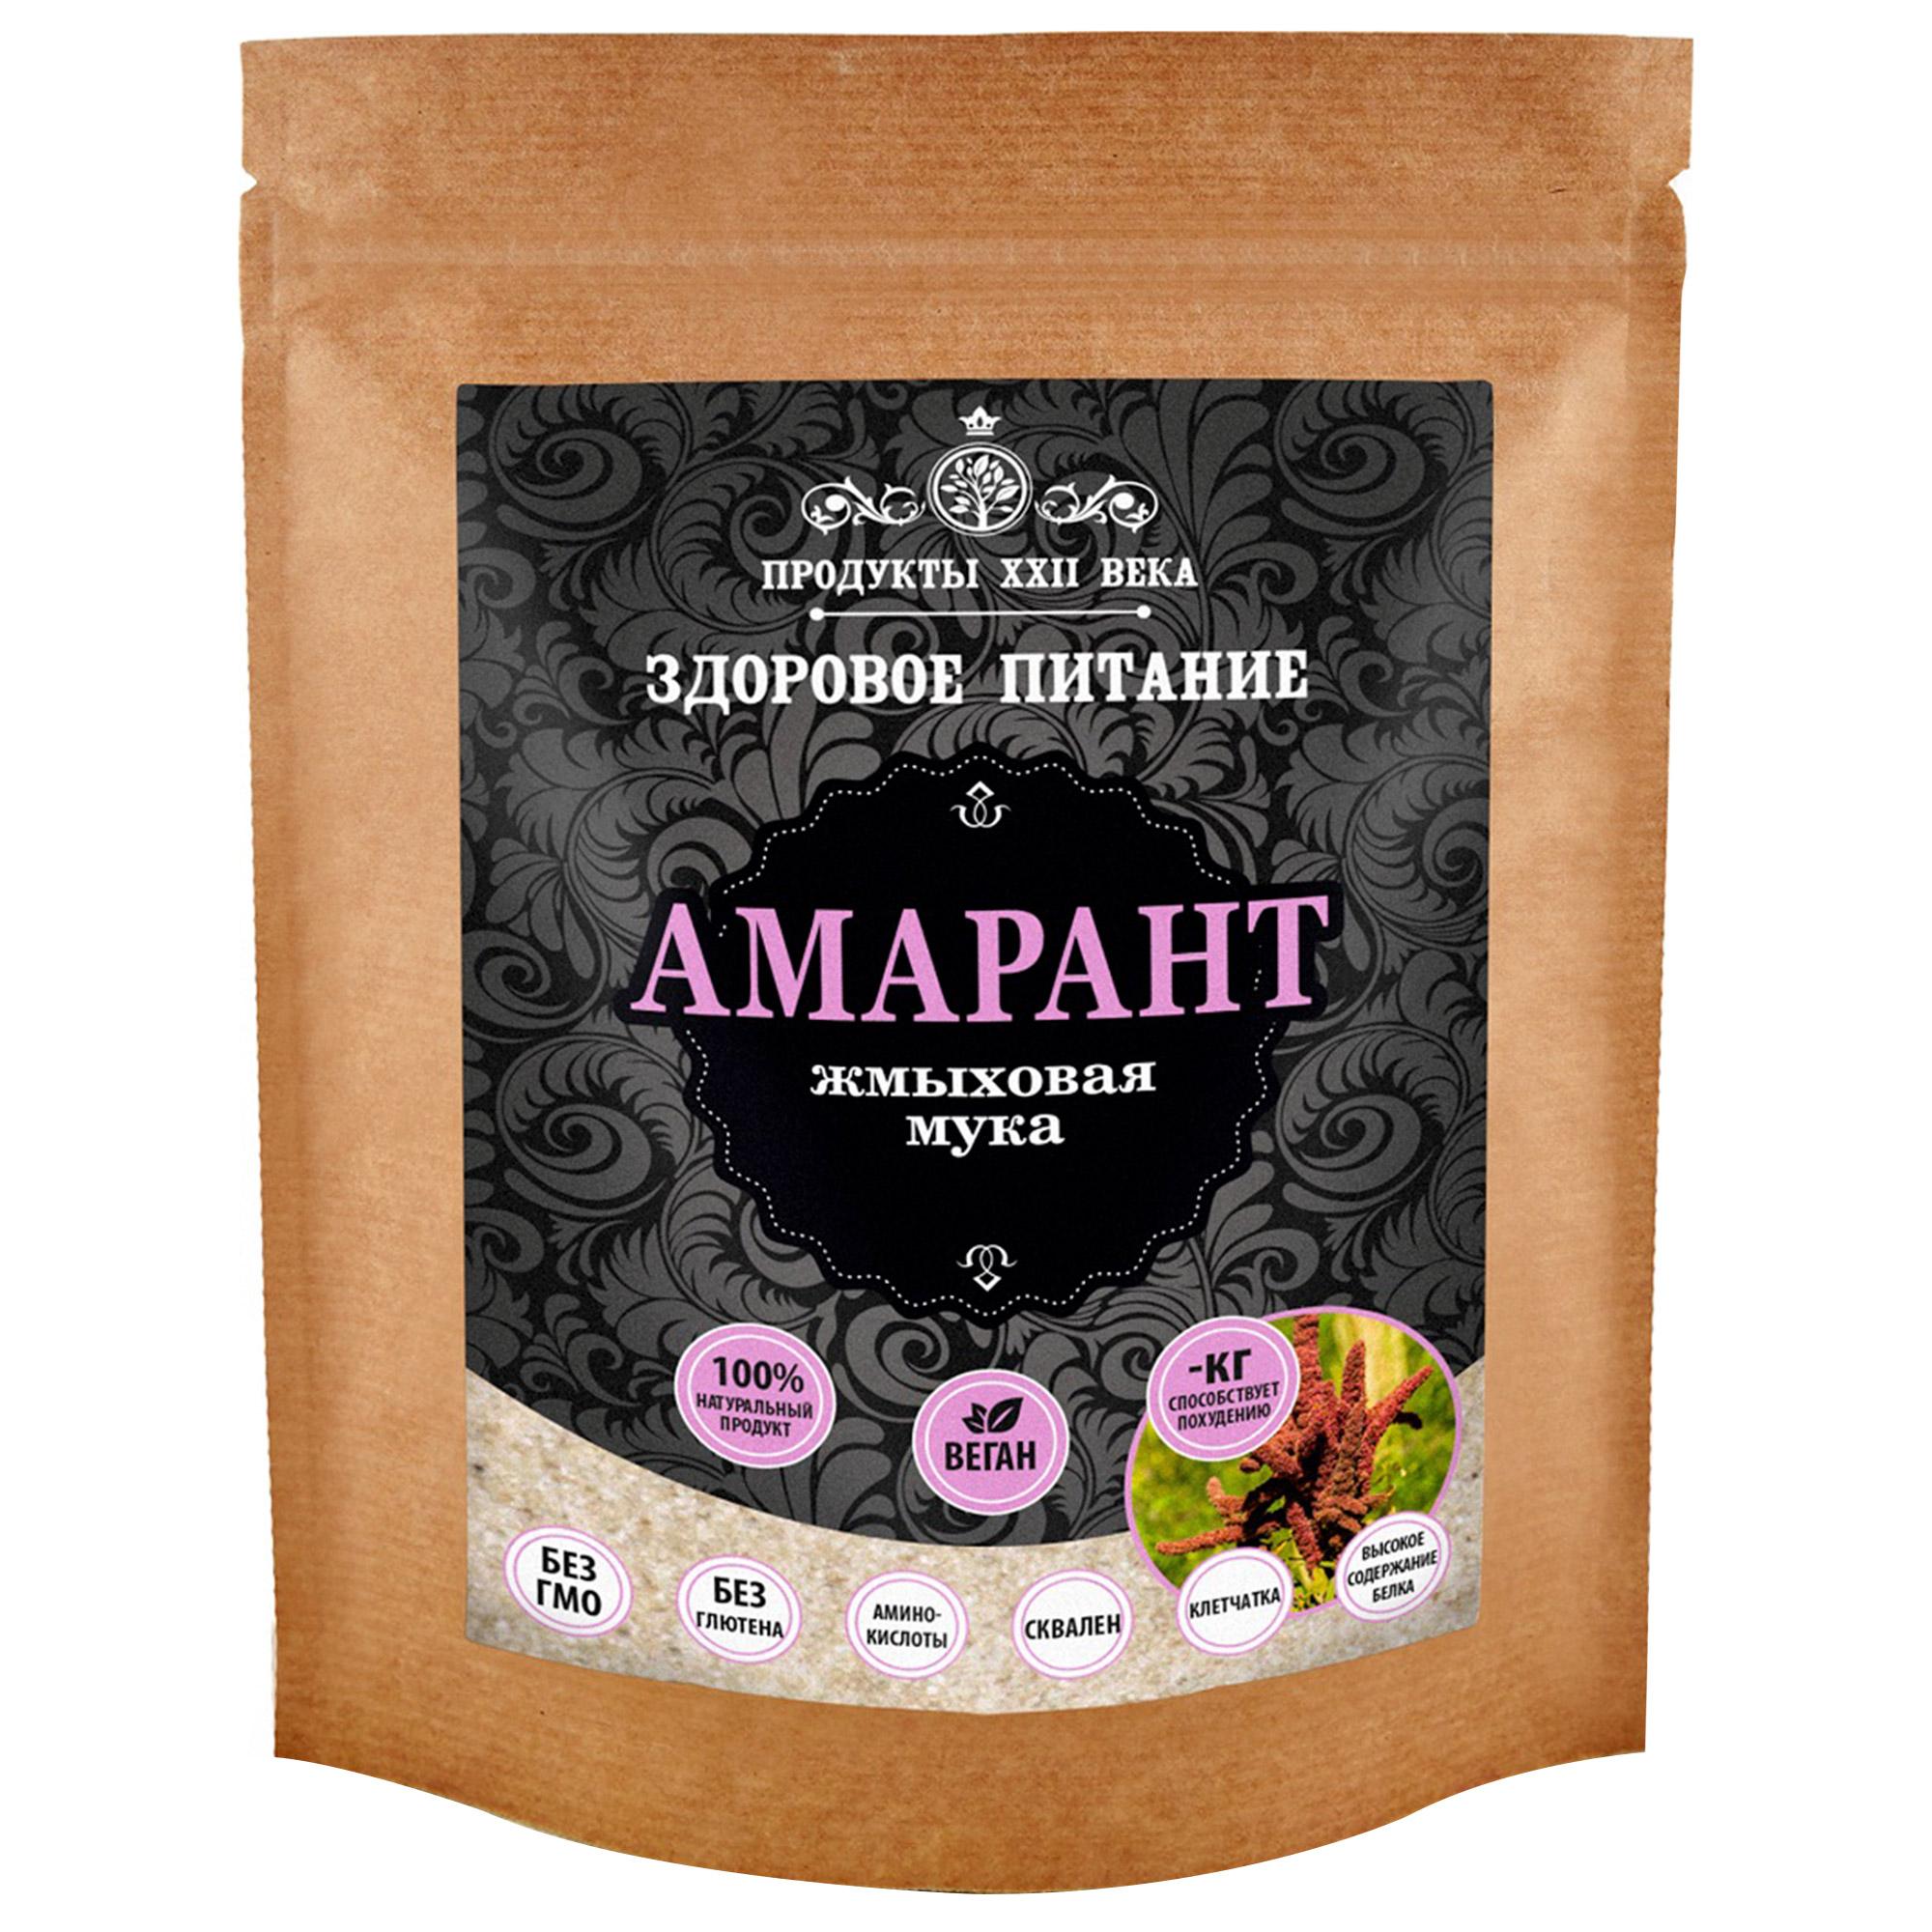 Мука жмыховая Продукты XXII века Амарант, 200 г